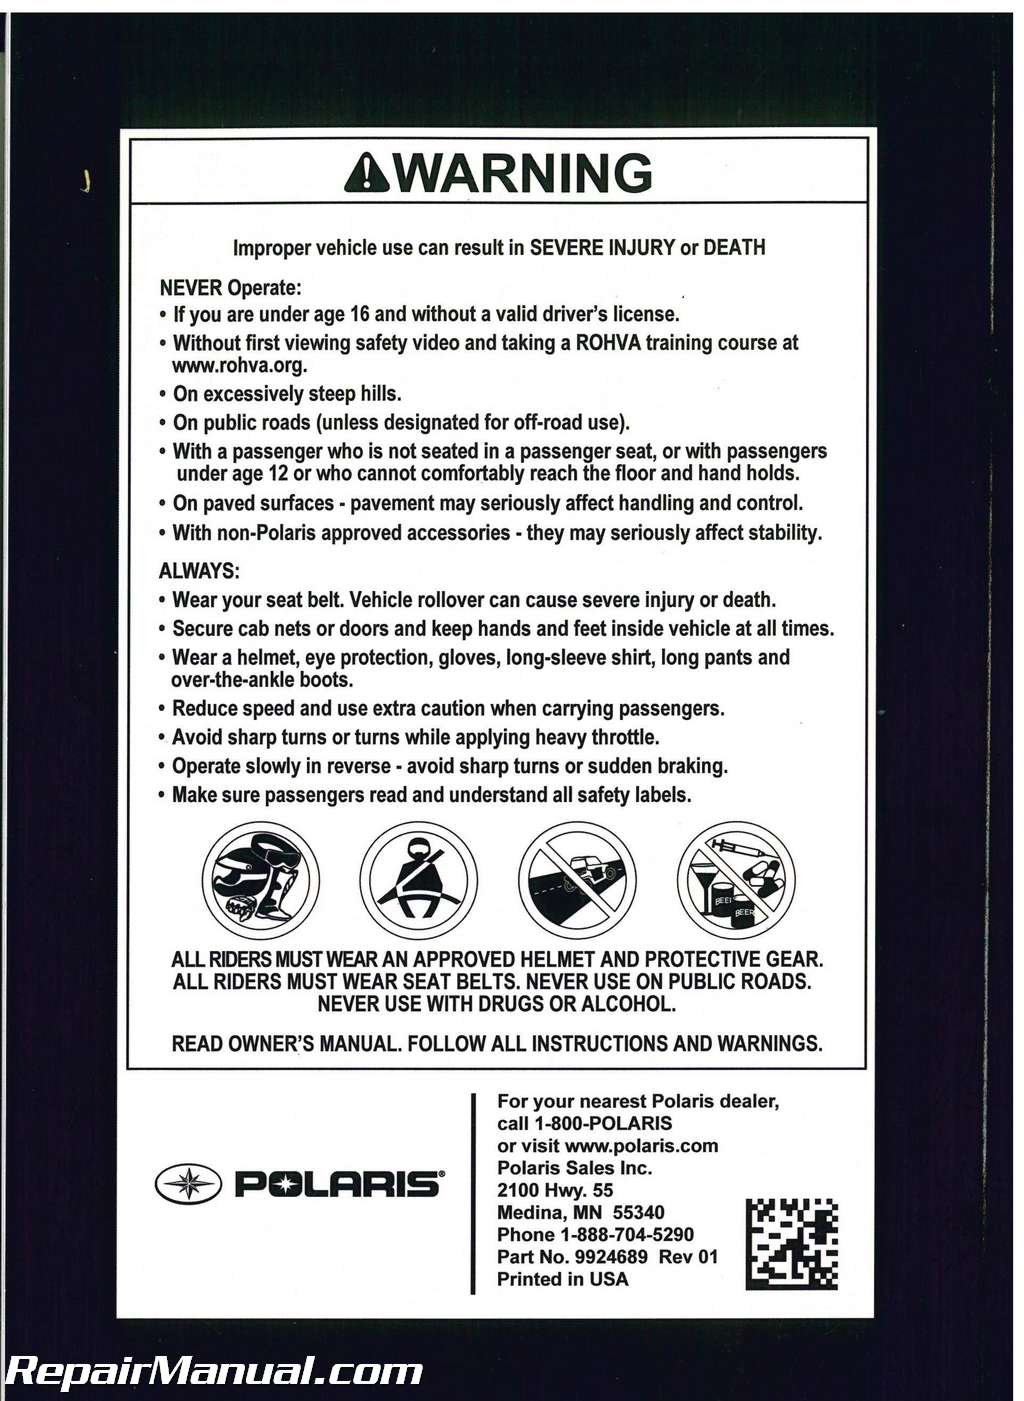 polaris ranger 6x6 parts manual